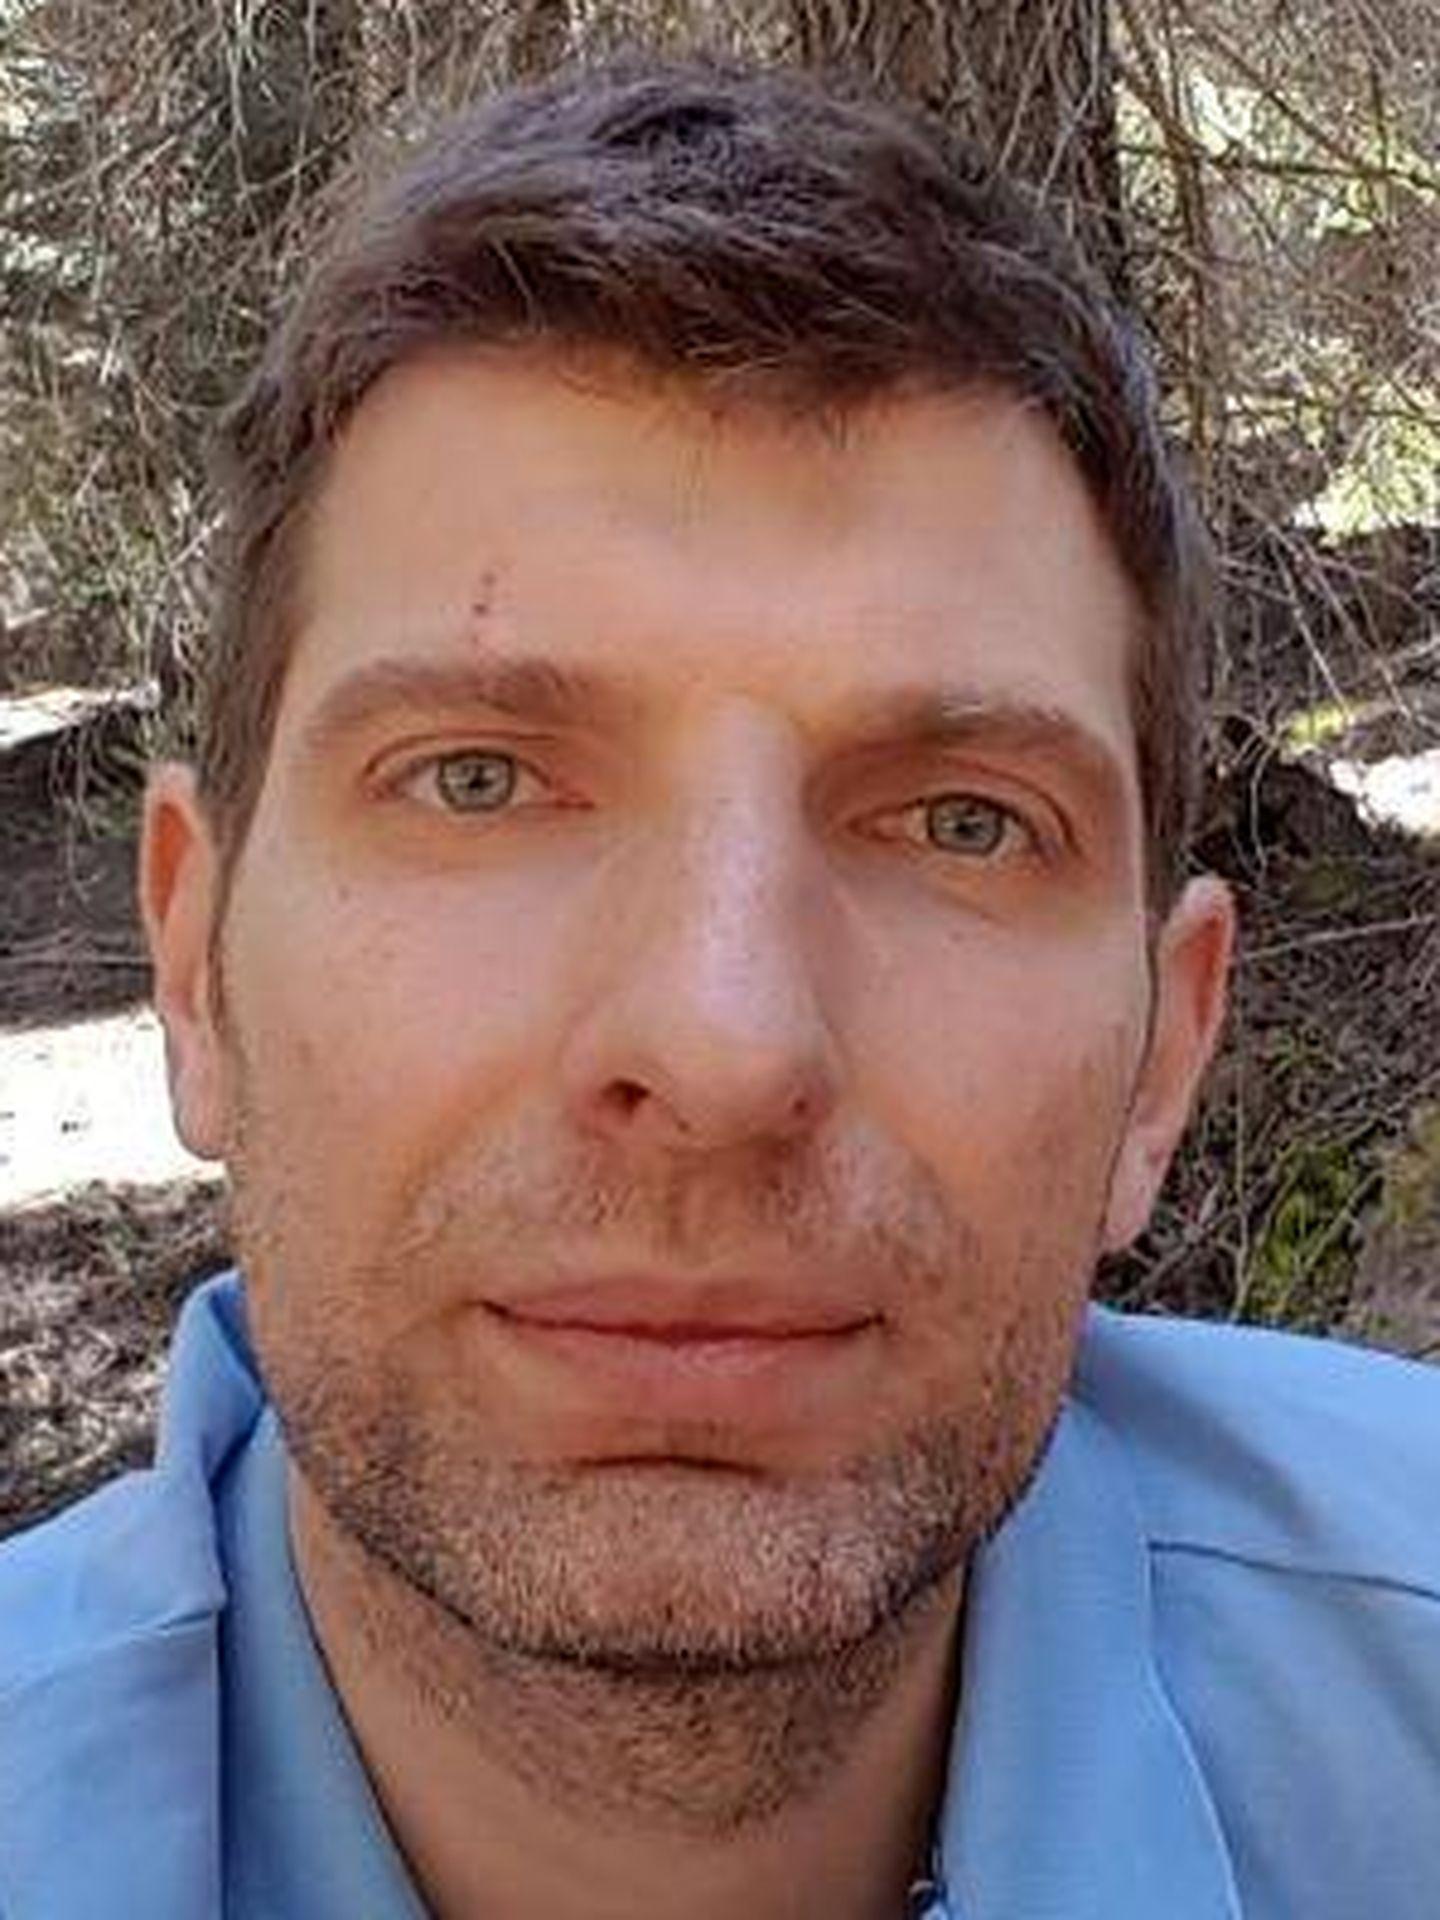 Yaroslav Goncharov, fundador de FaceApp